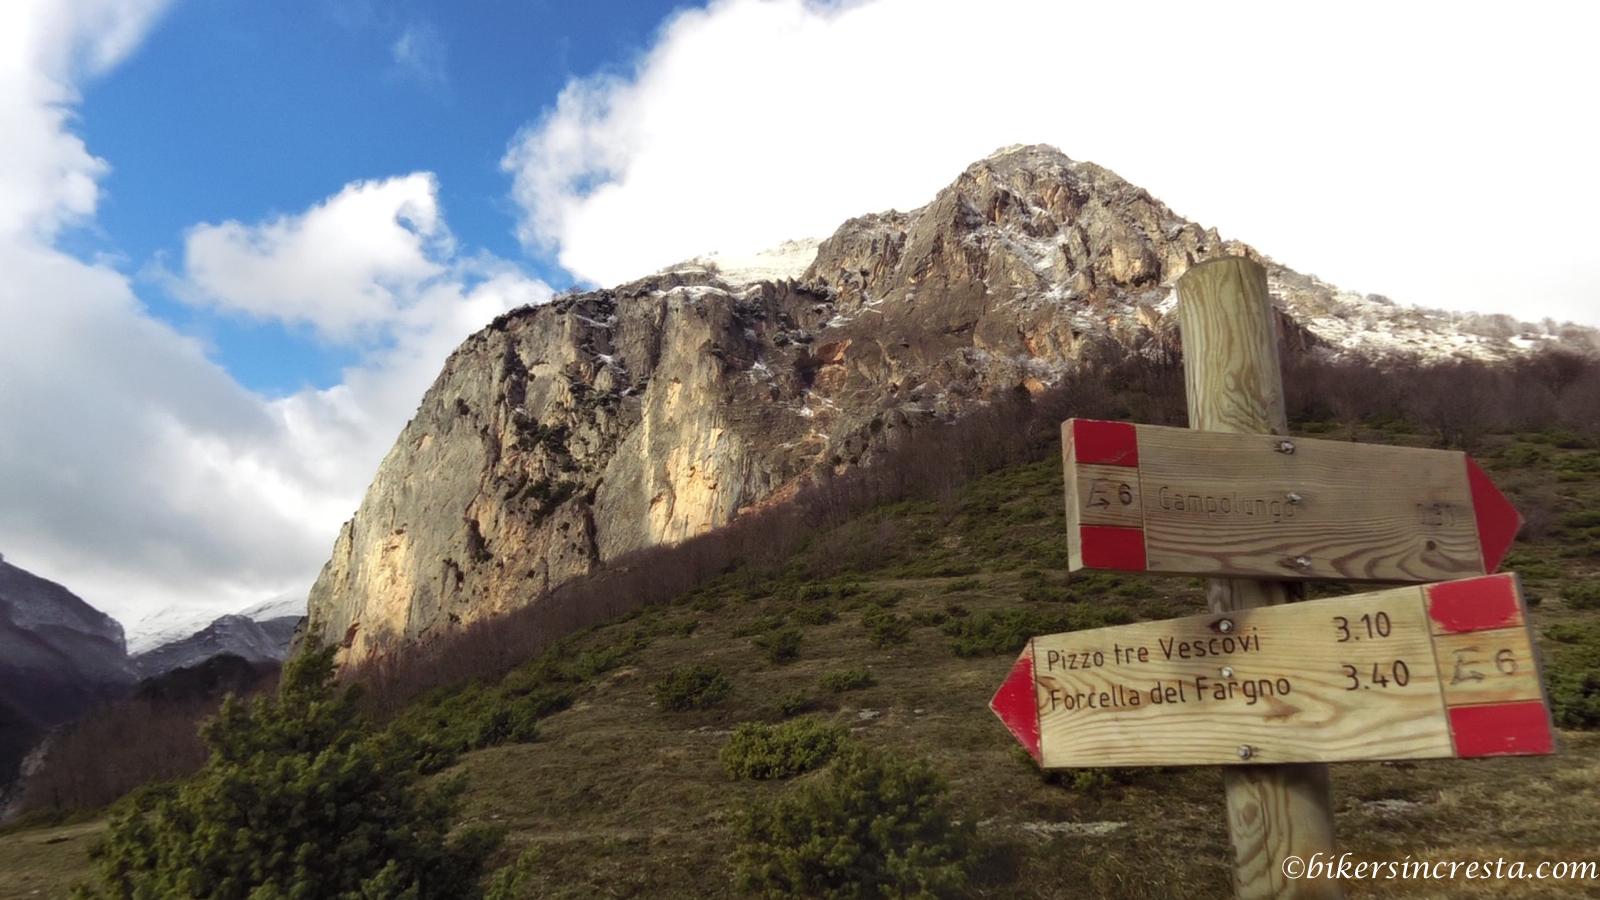 Piedivalle-Balzo Rosso